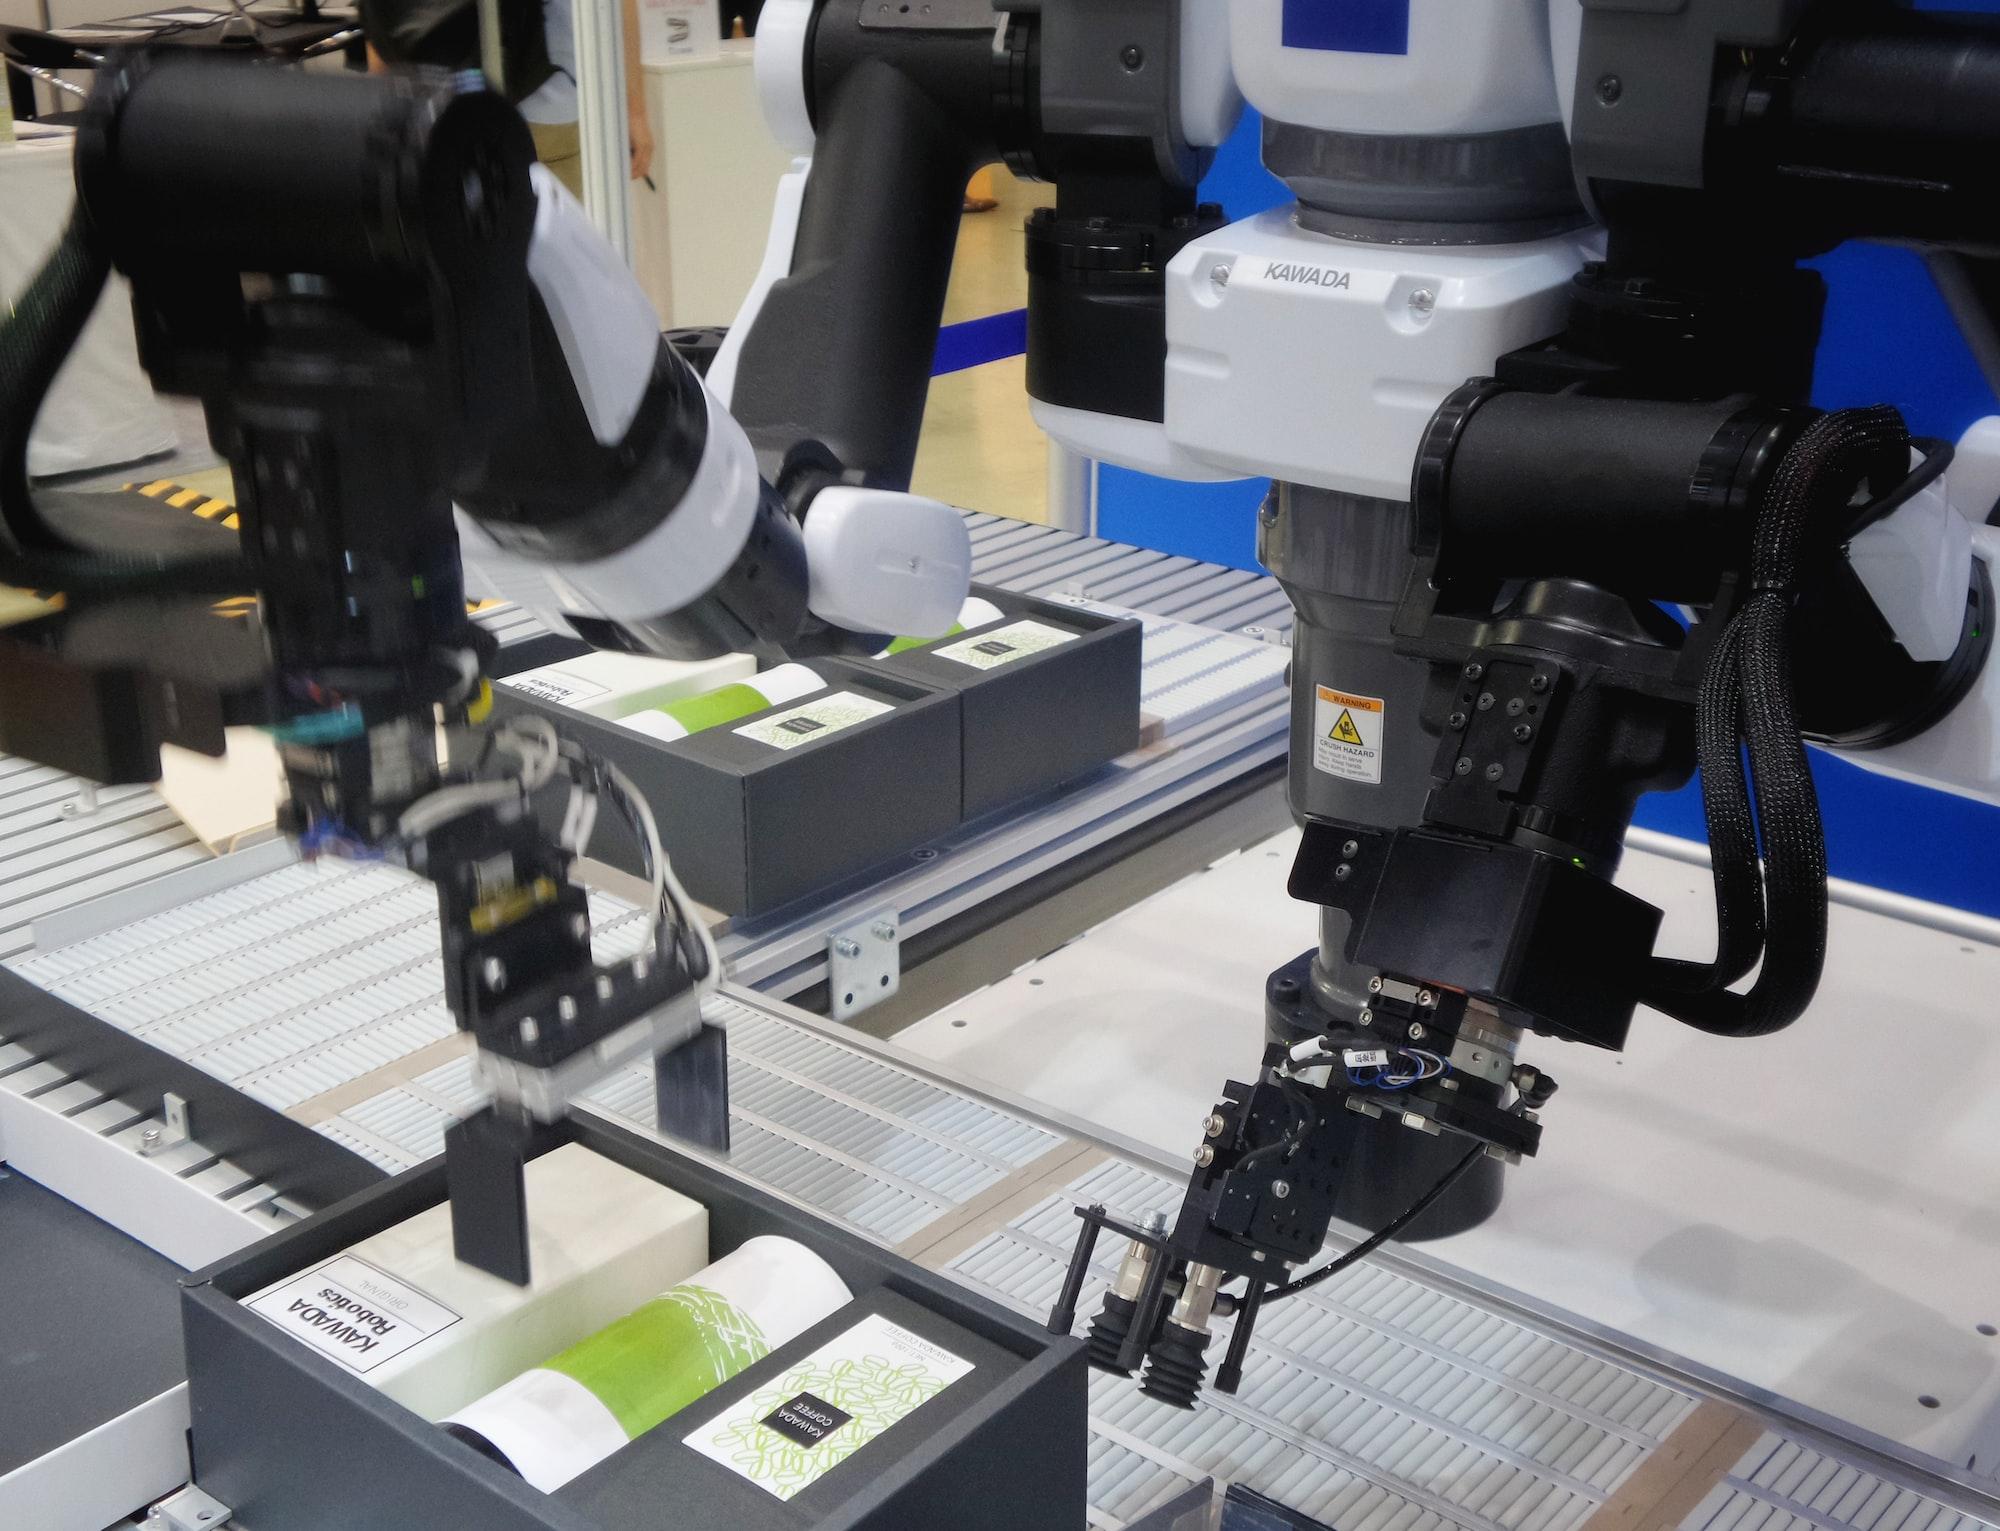 Mechatronics Engineering: new du jour discipline